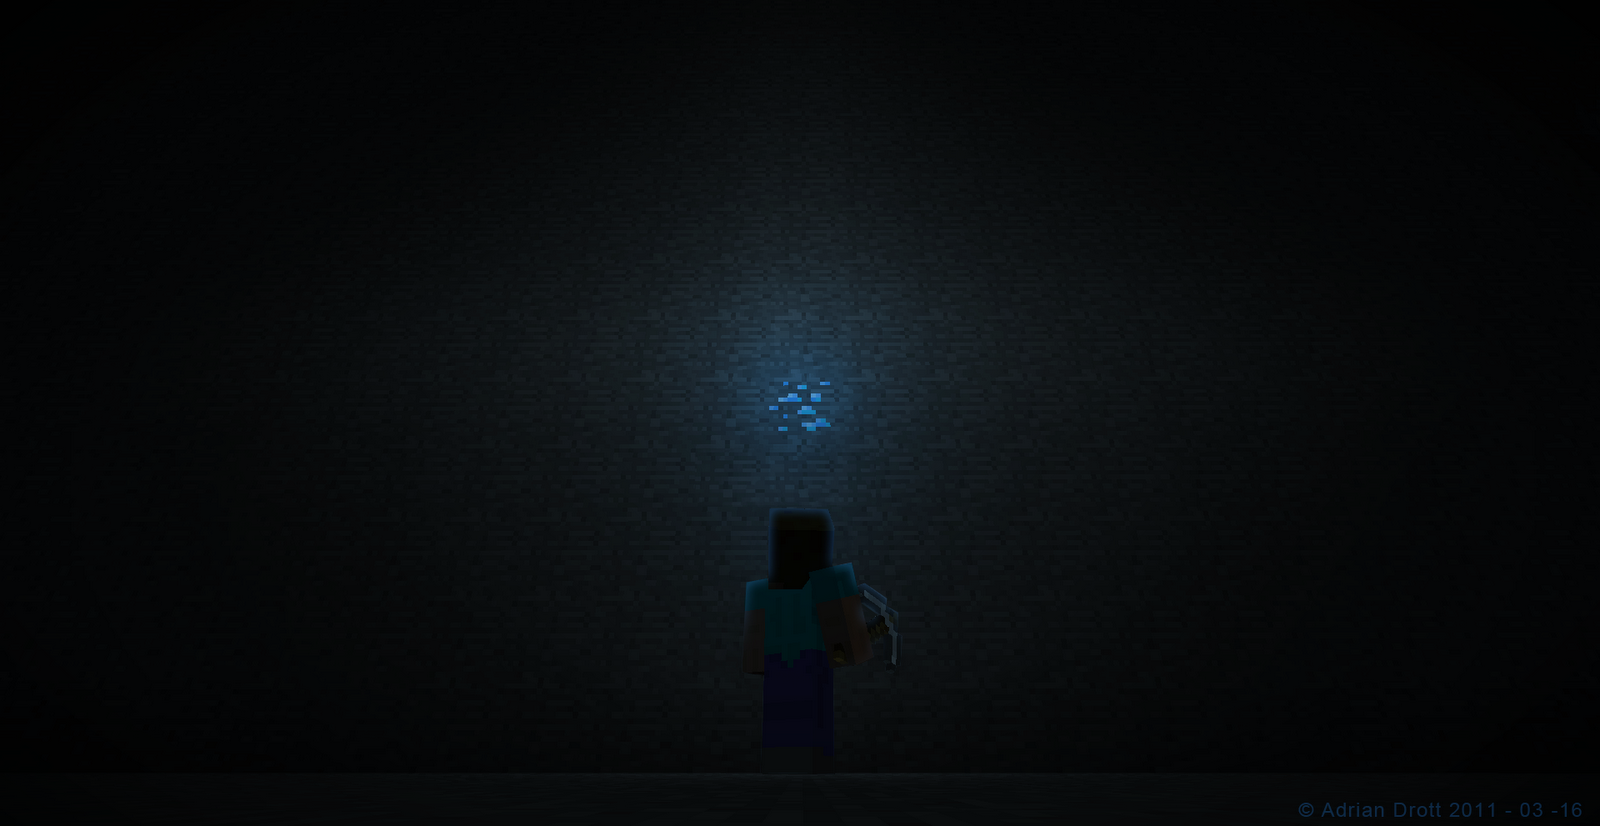 Minecraft Diamond Ore Wallpaper Wyatttwirp minecraft diamond 1600x826